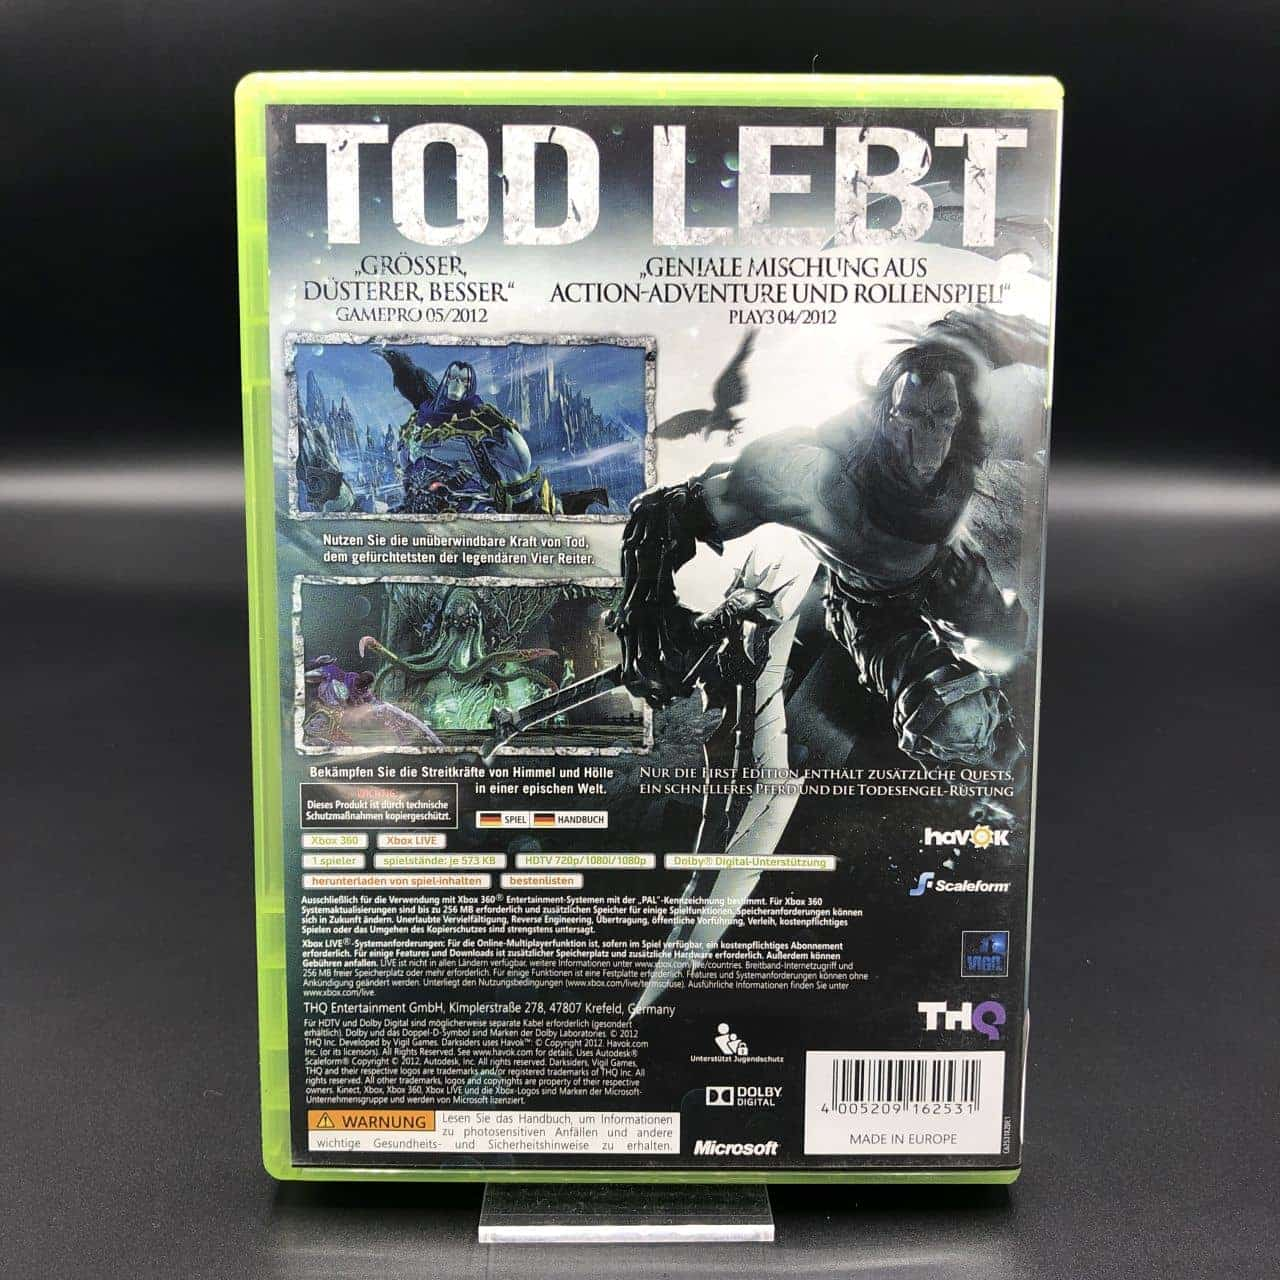 Darksiders II (First Edition) (Komplett) (Sehr gut) Xbox 360